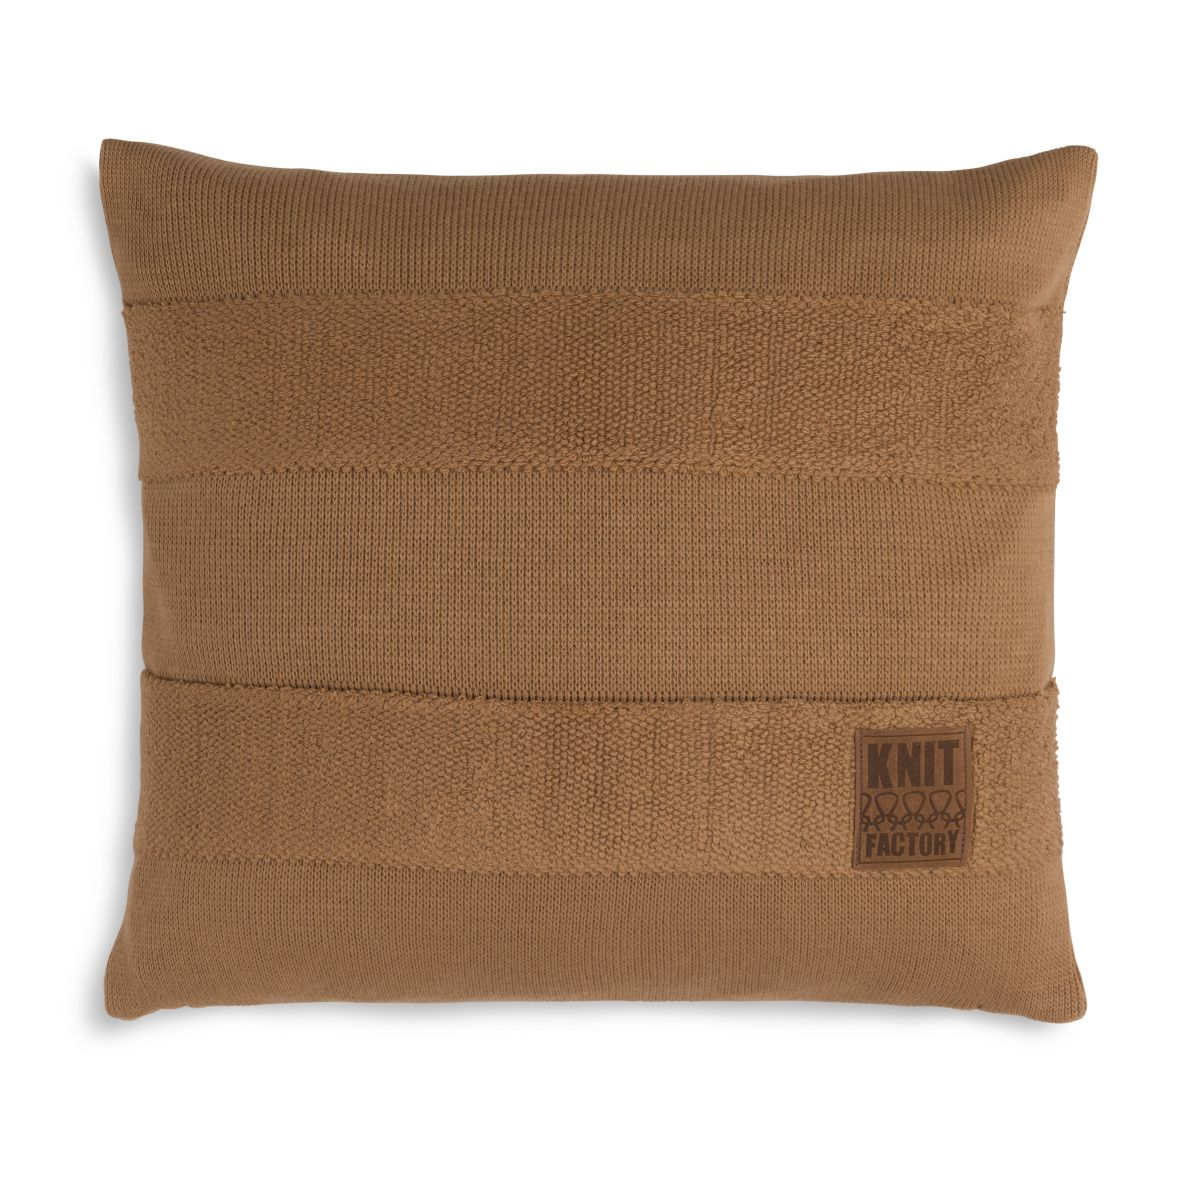 knit factory 1351220 yara kussen 50x50 new camel 1